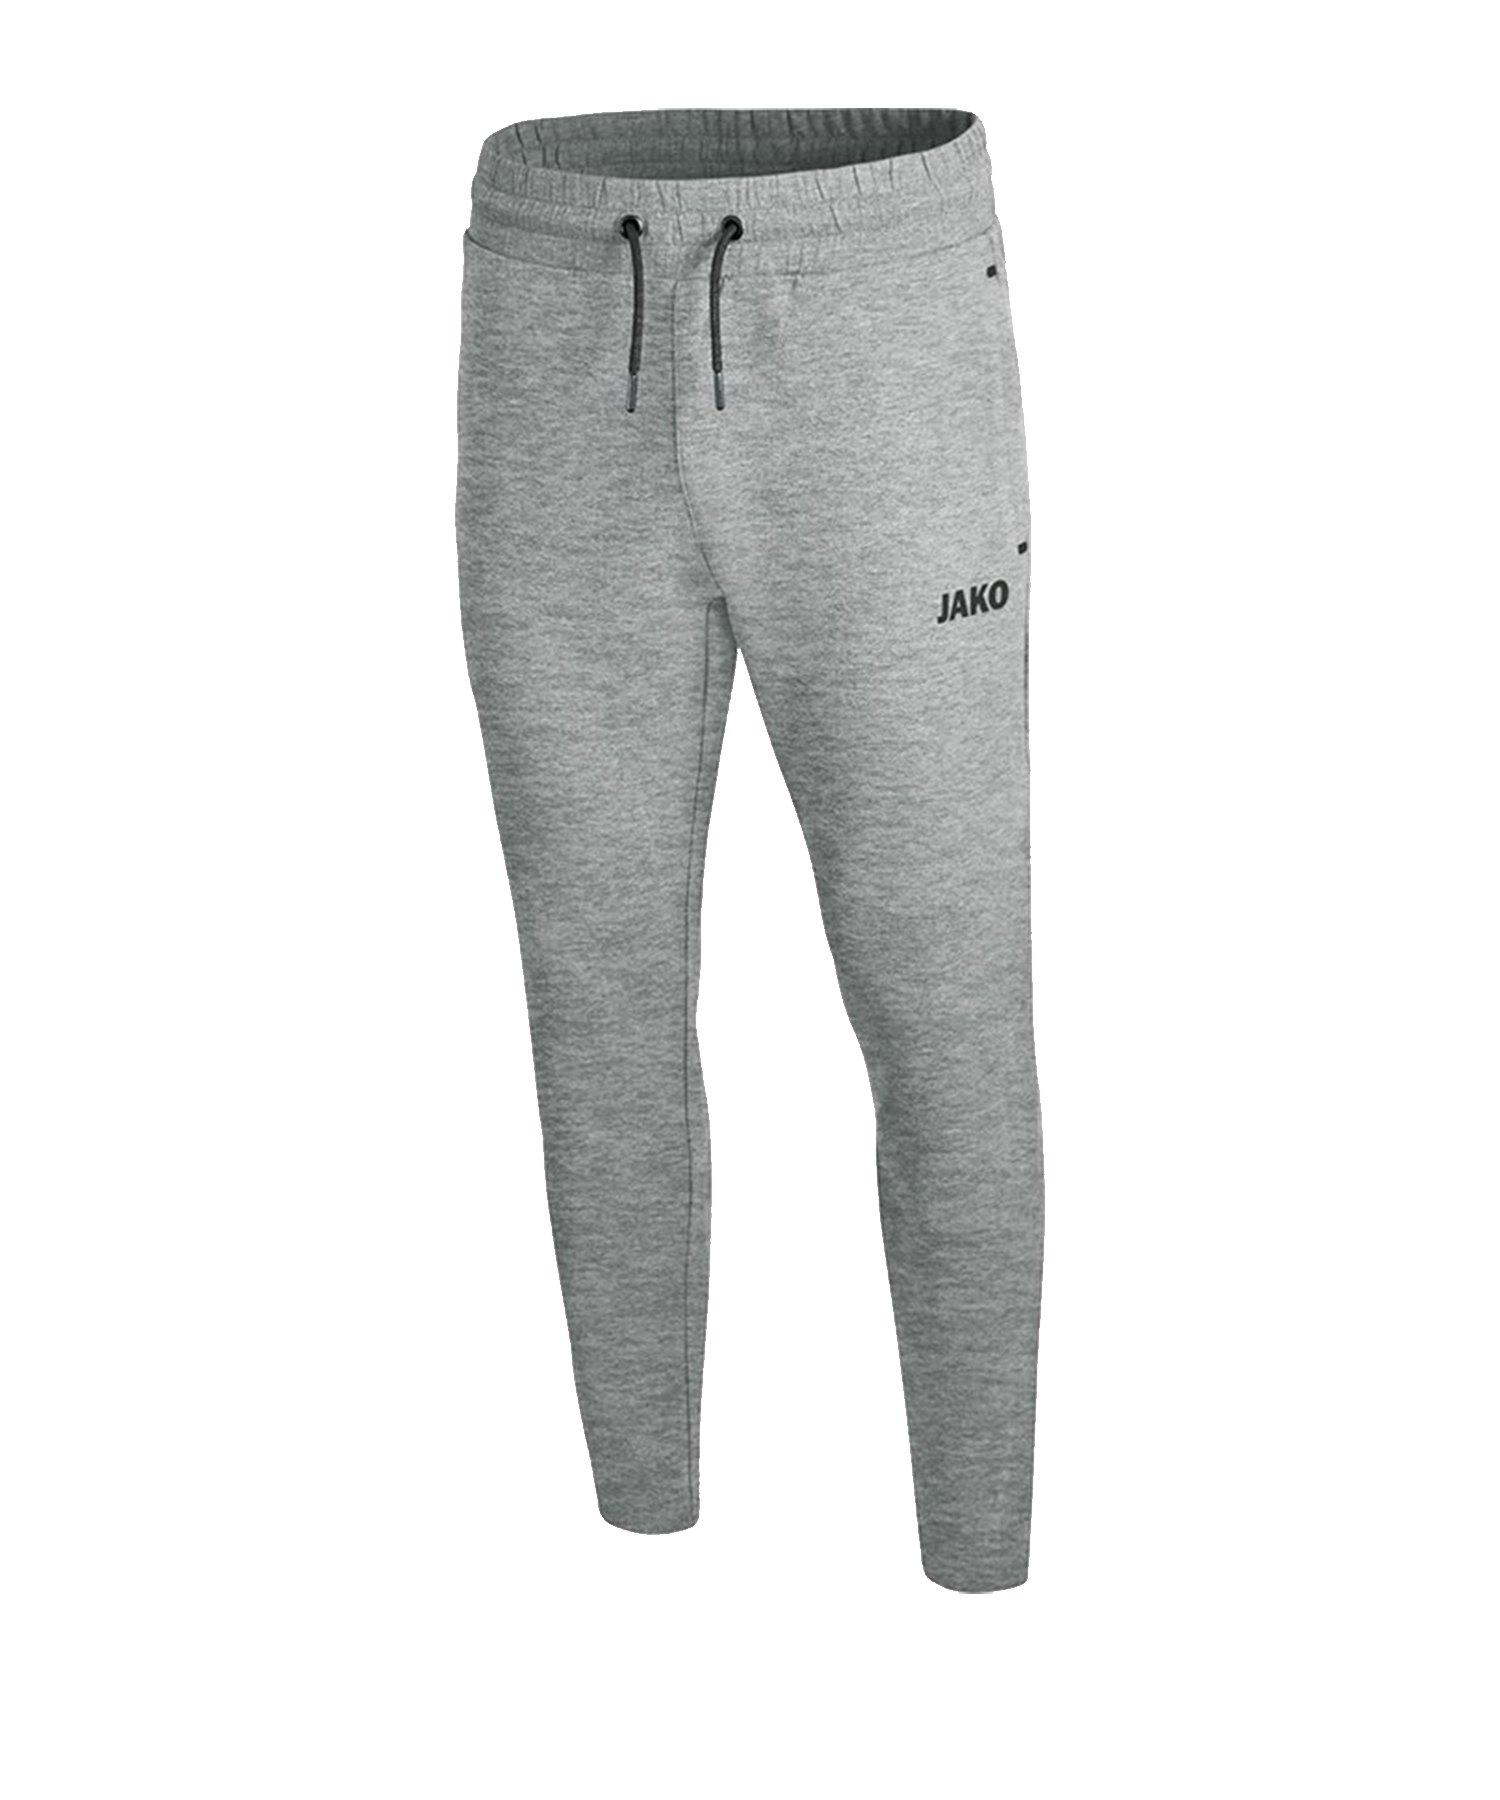 Jako Premium Basic Jogginghose Damen Grau F40 - grau